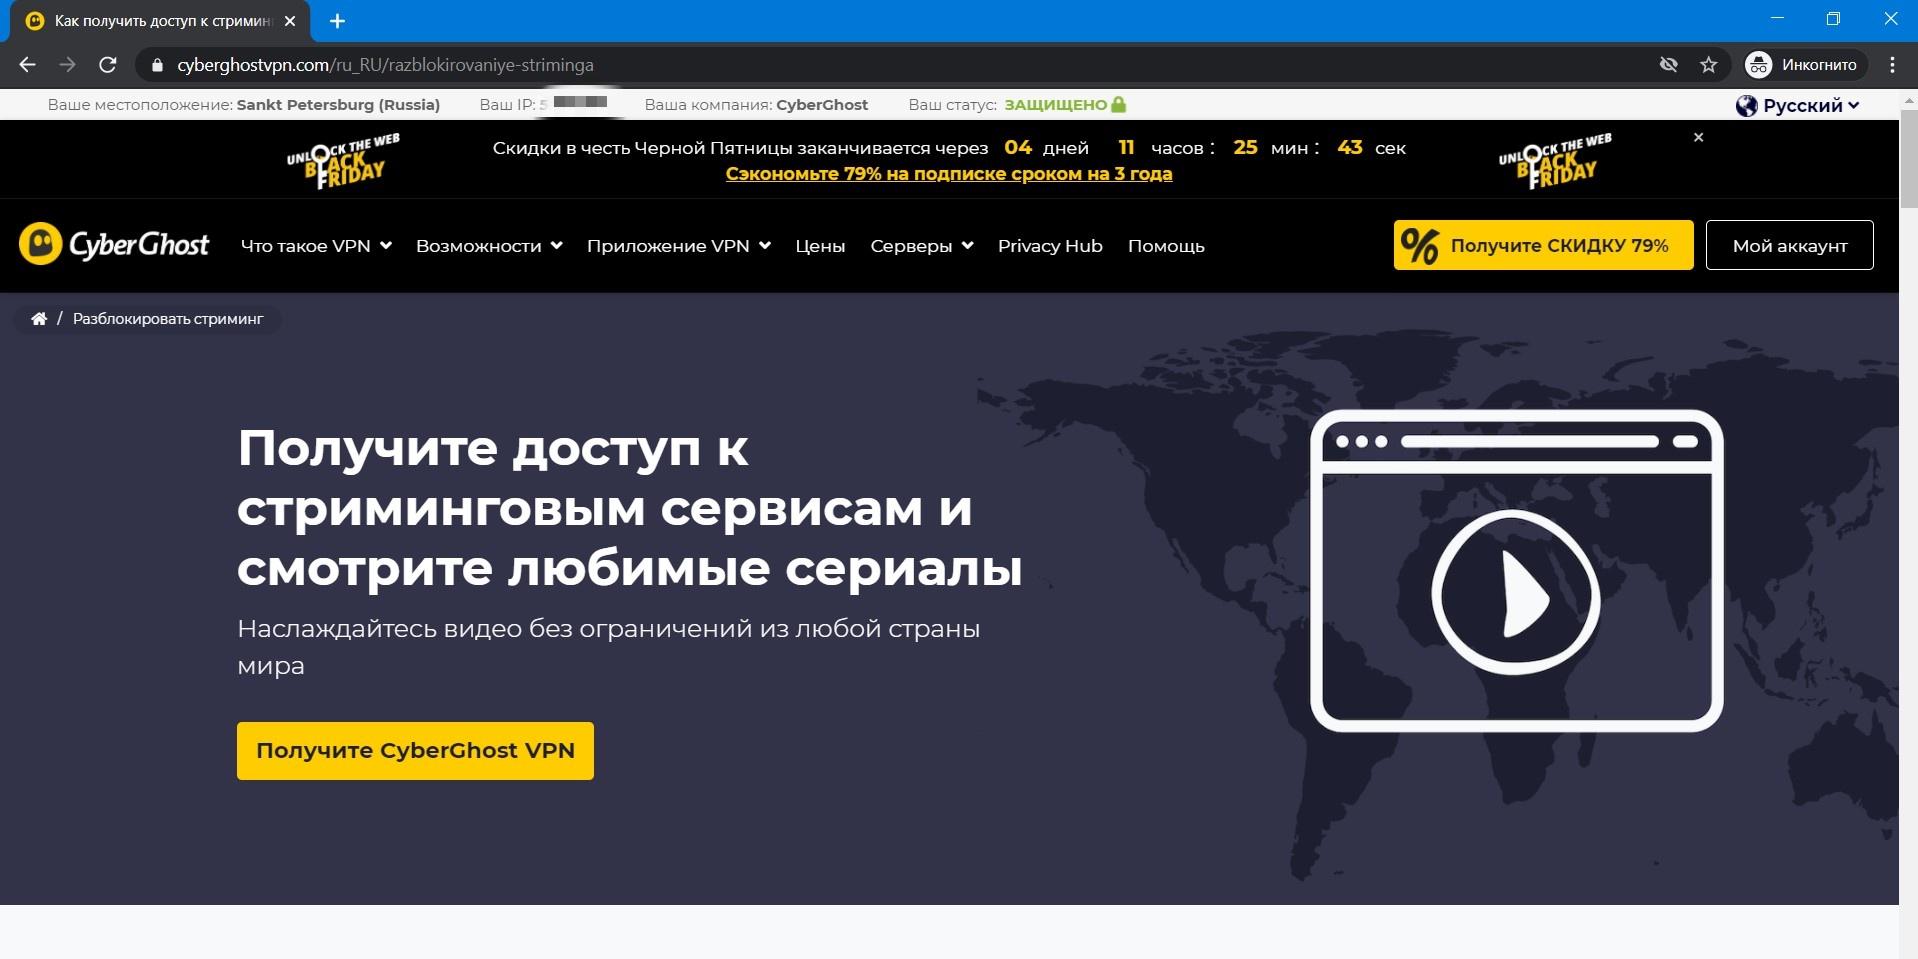 CyberGhost VPN откроет стриминг фильмов и матчей